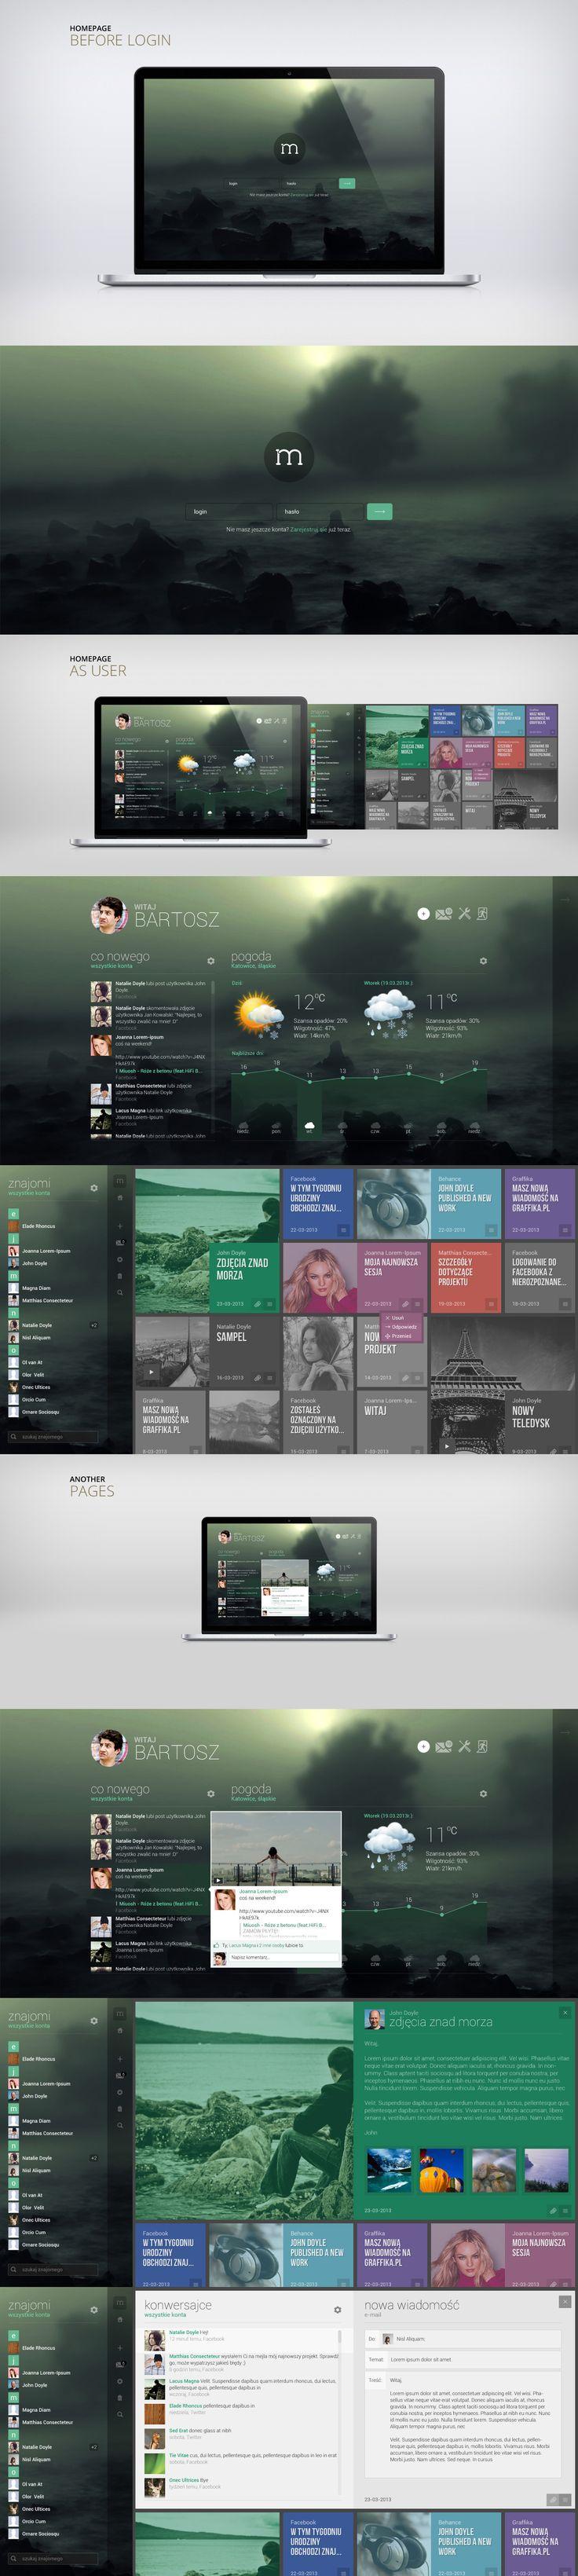 Modail by ~WuHaDesign | #webdesign #it #web #design #layout #userinterface #website #webdesign <<< repinned by an #advertising #agency from #Hamburg / #Germany - www.BlickeDeeler.de